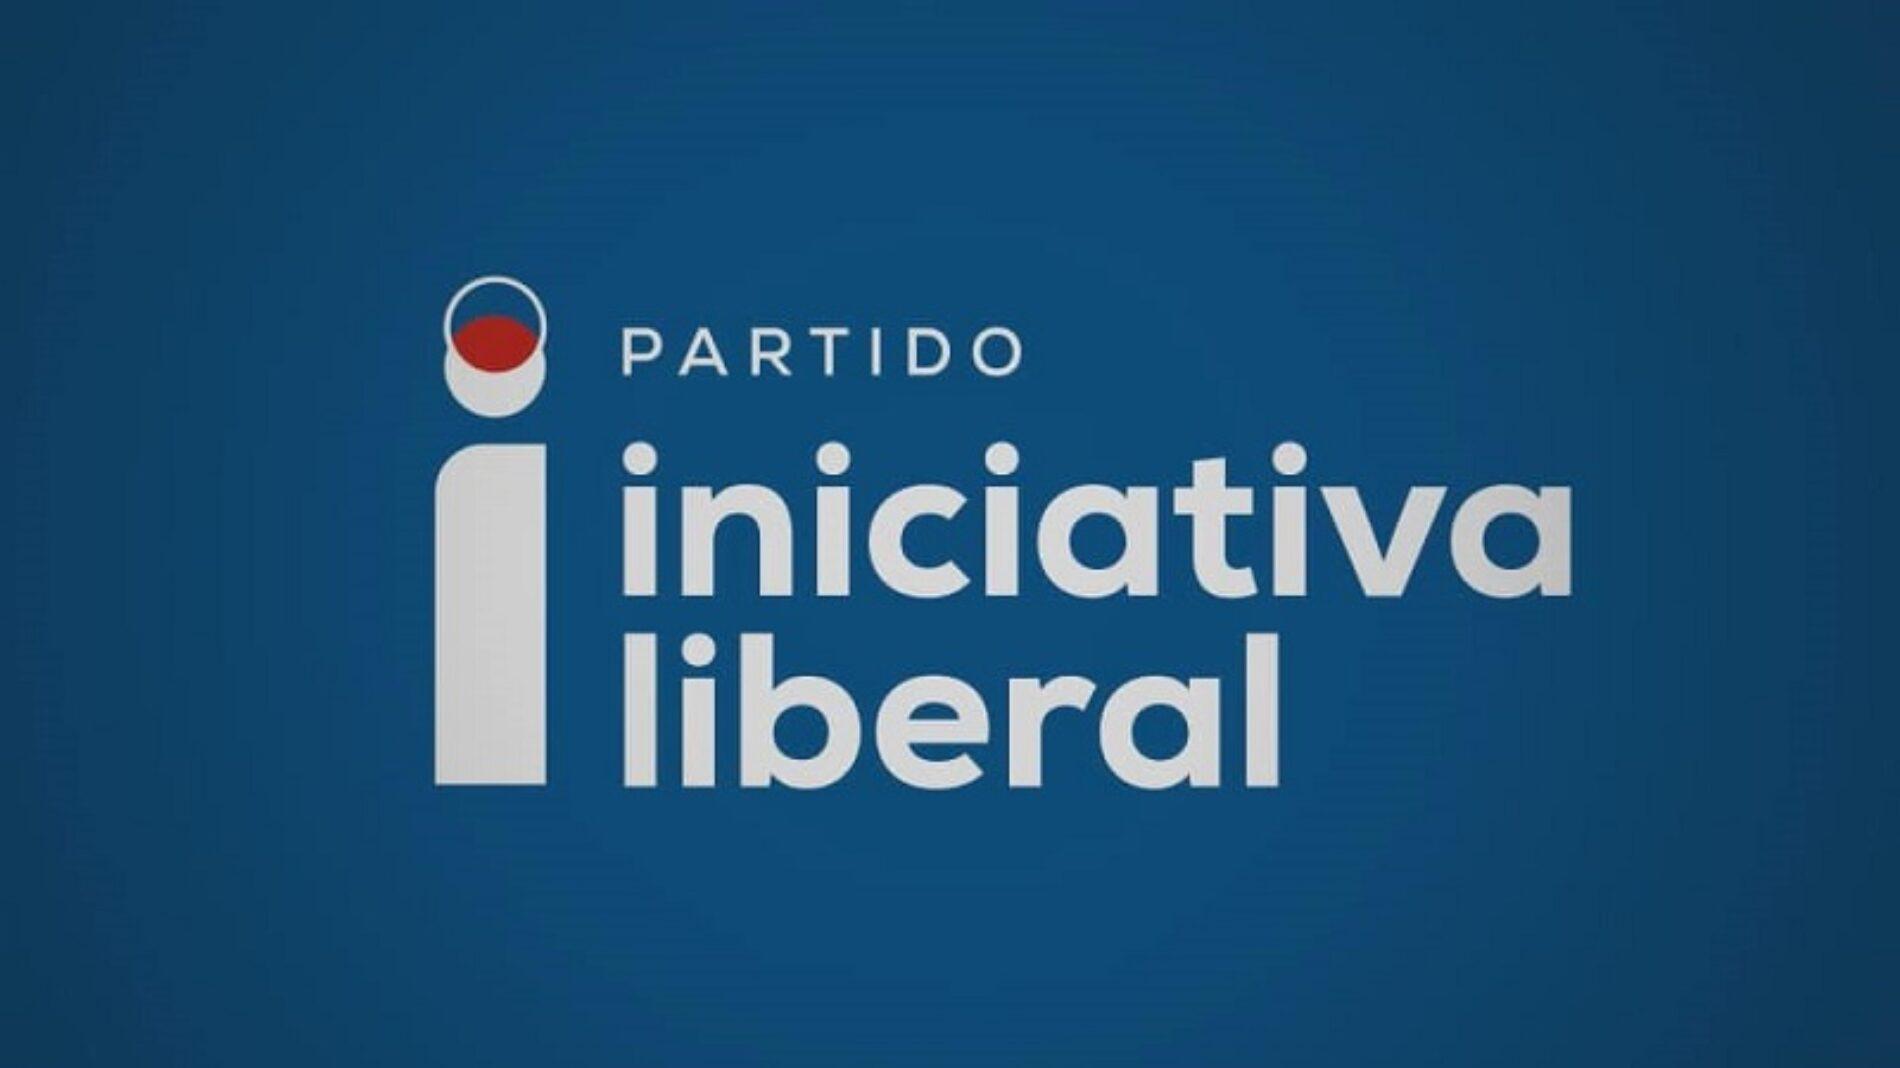 Partido Iniciativa Liberal formalizou núcleo territorial em Coimbra